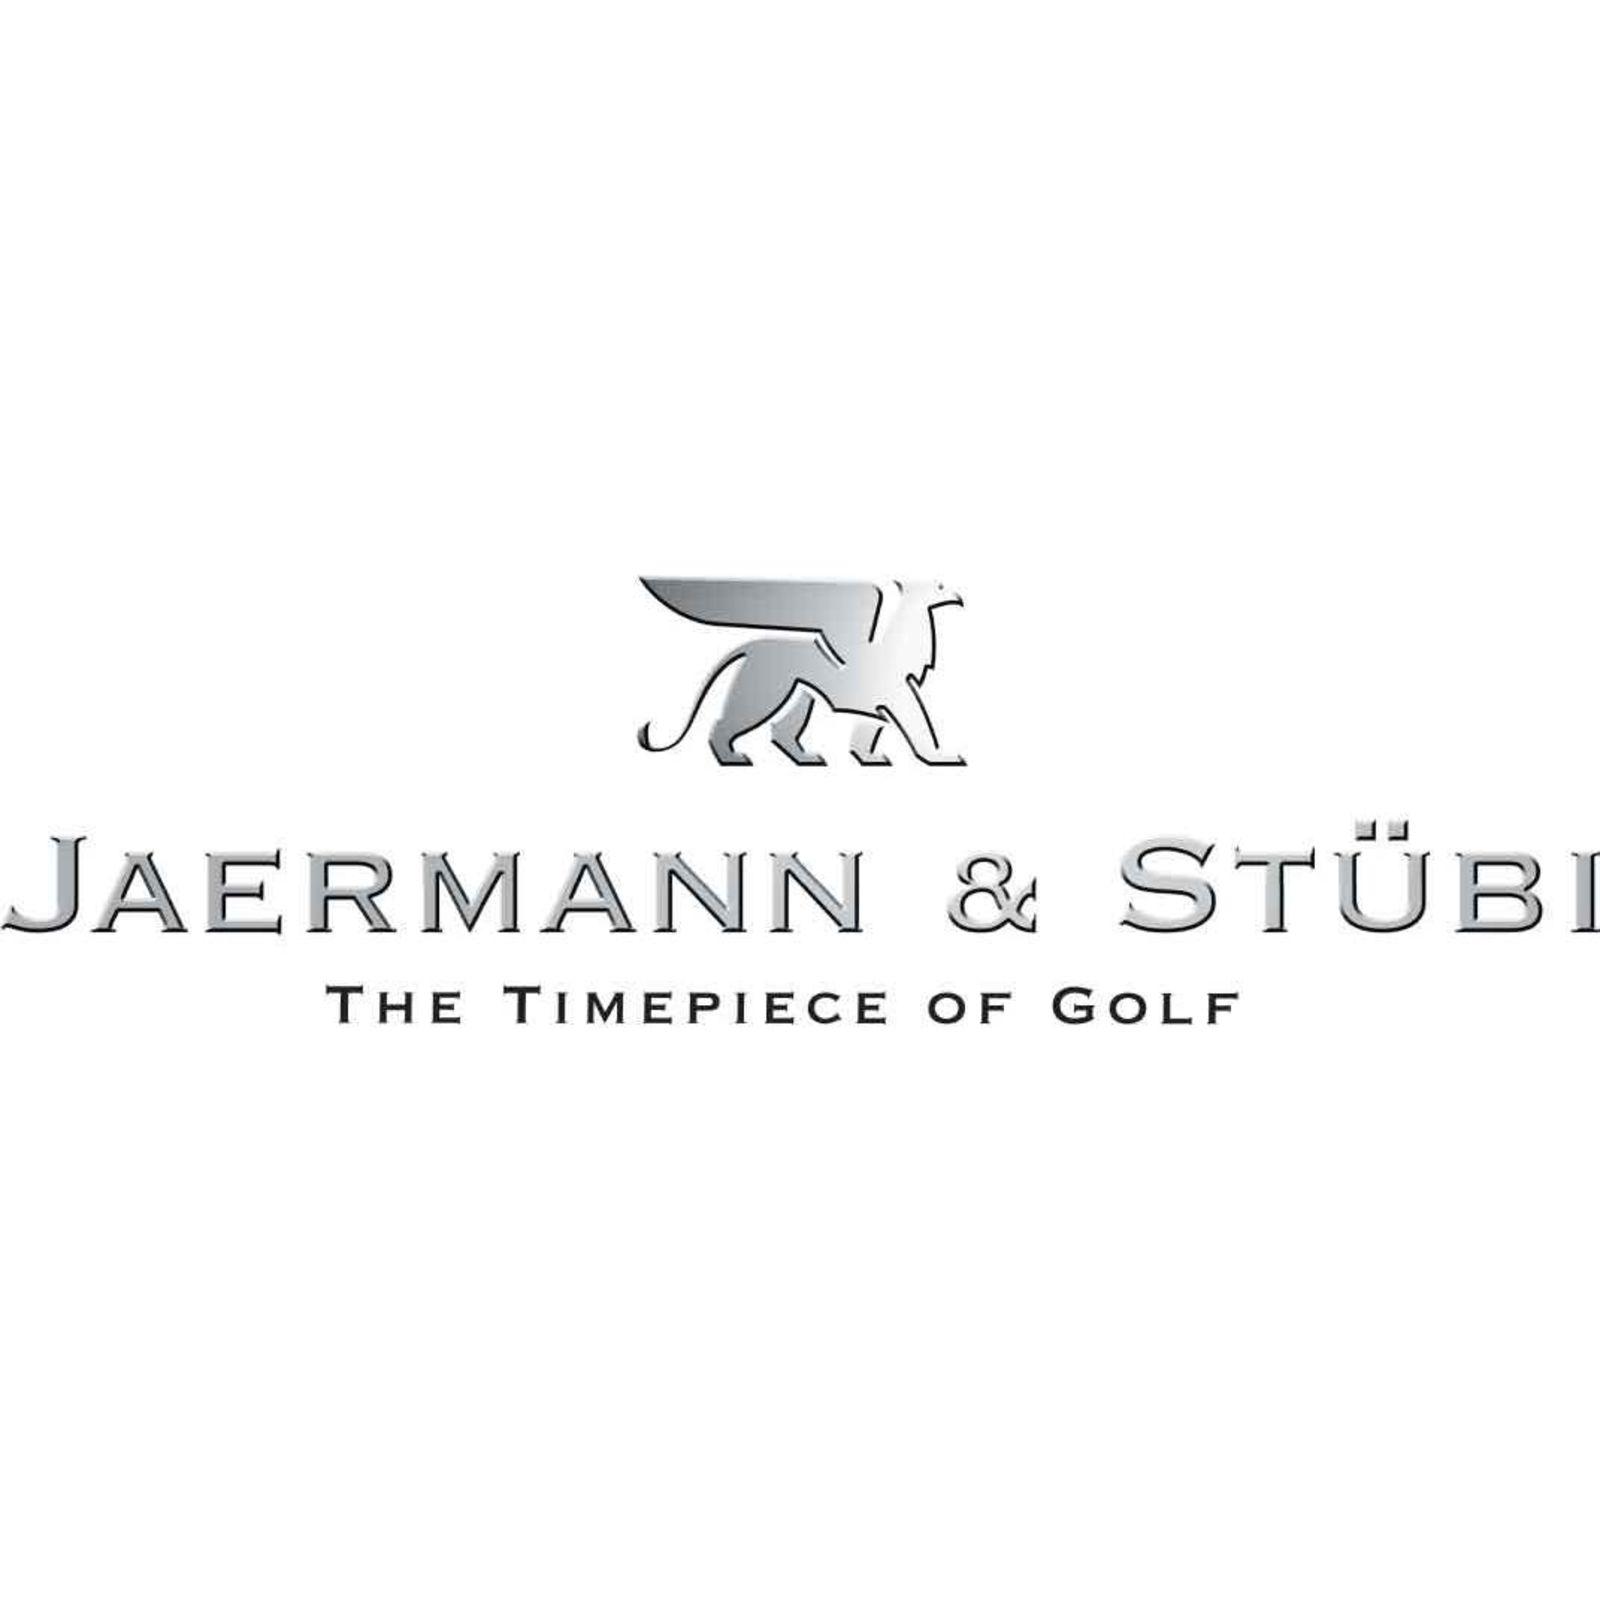 Jaermann & Stübi (Bild 1)